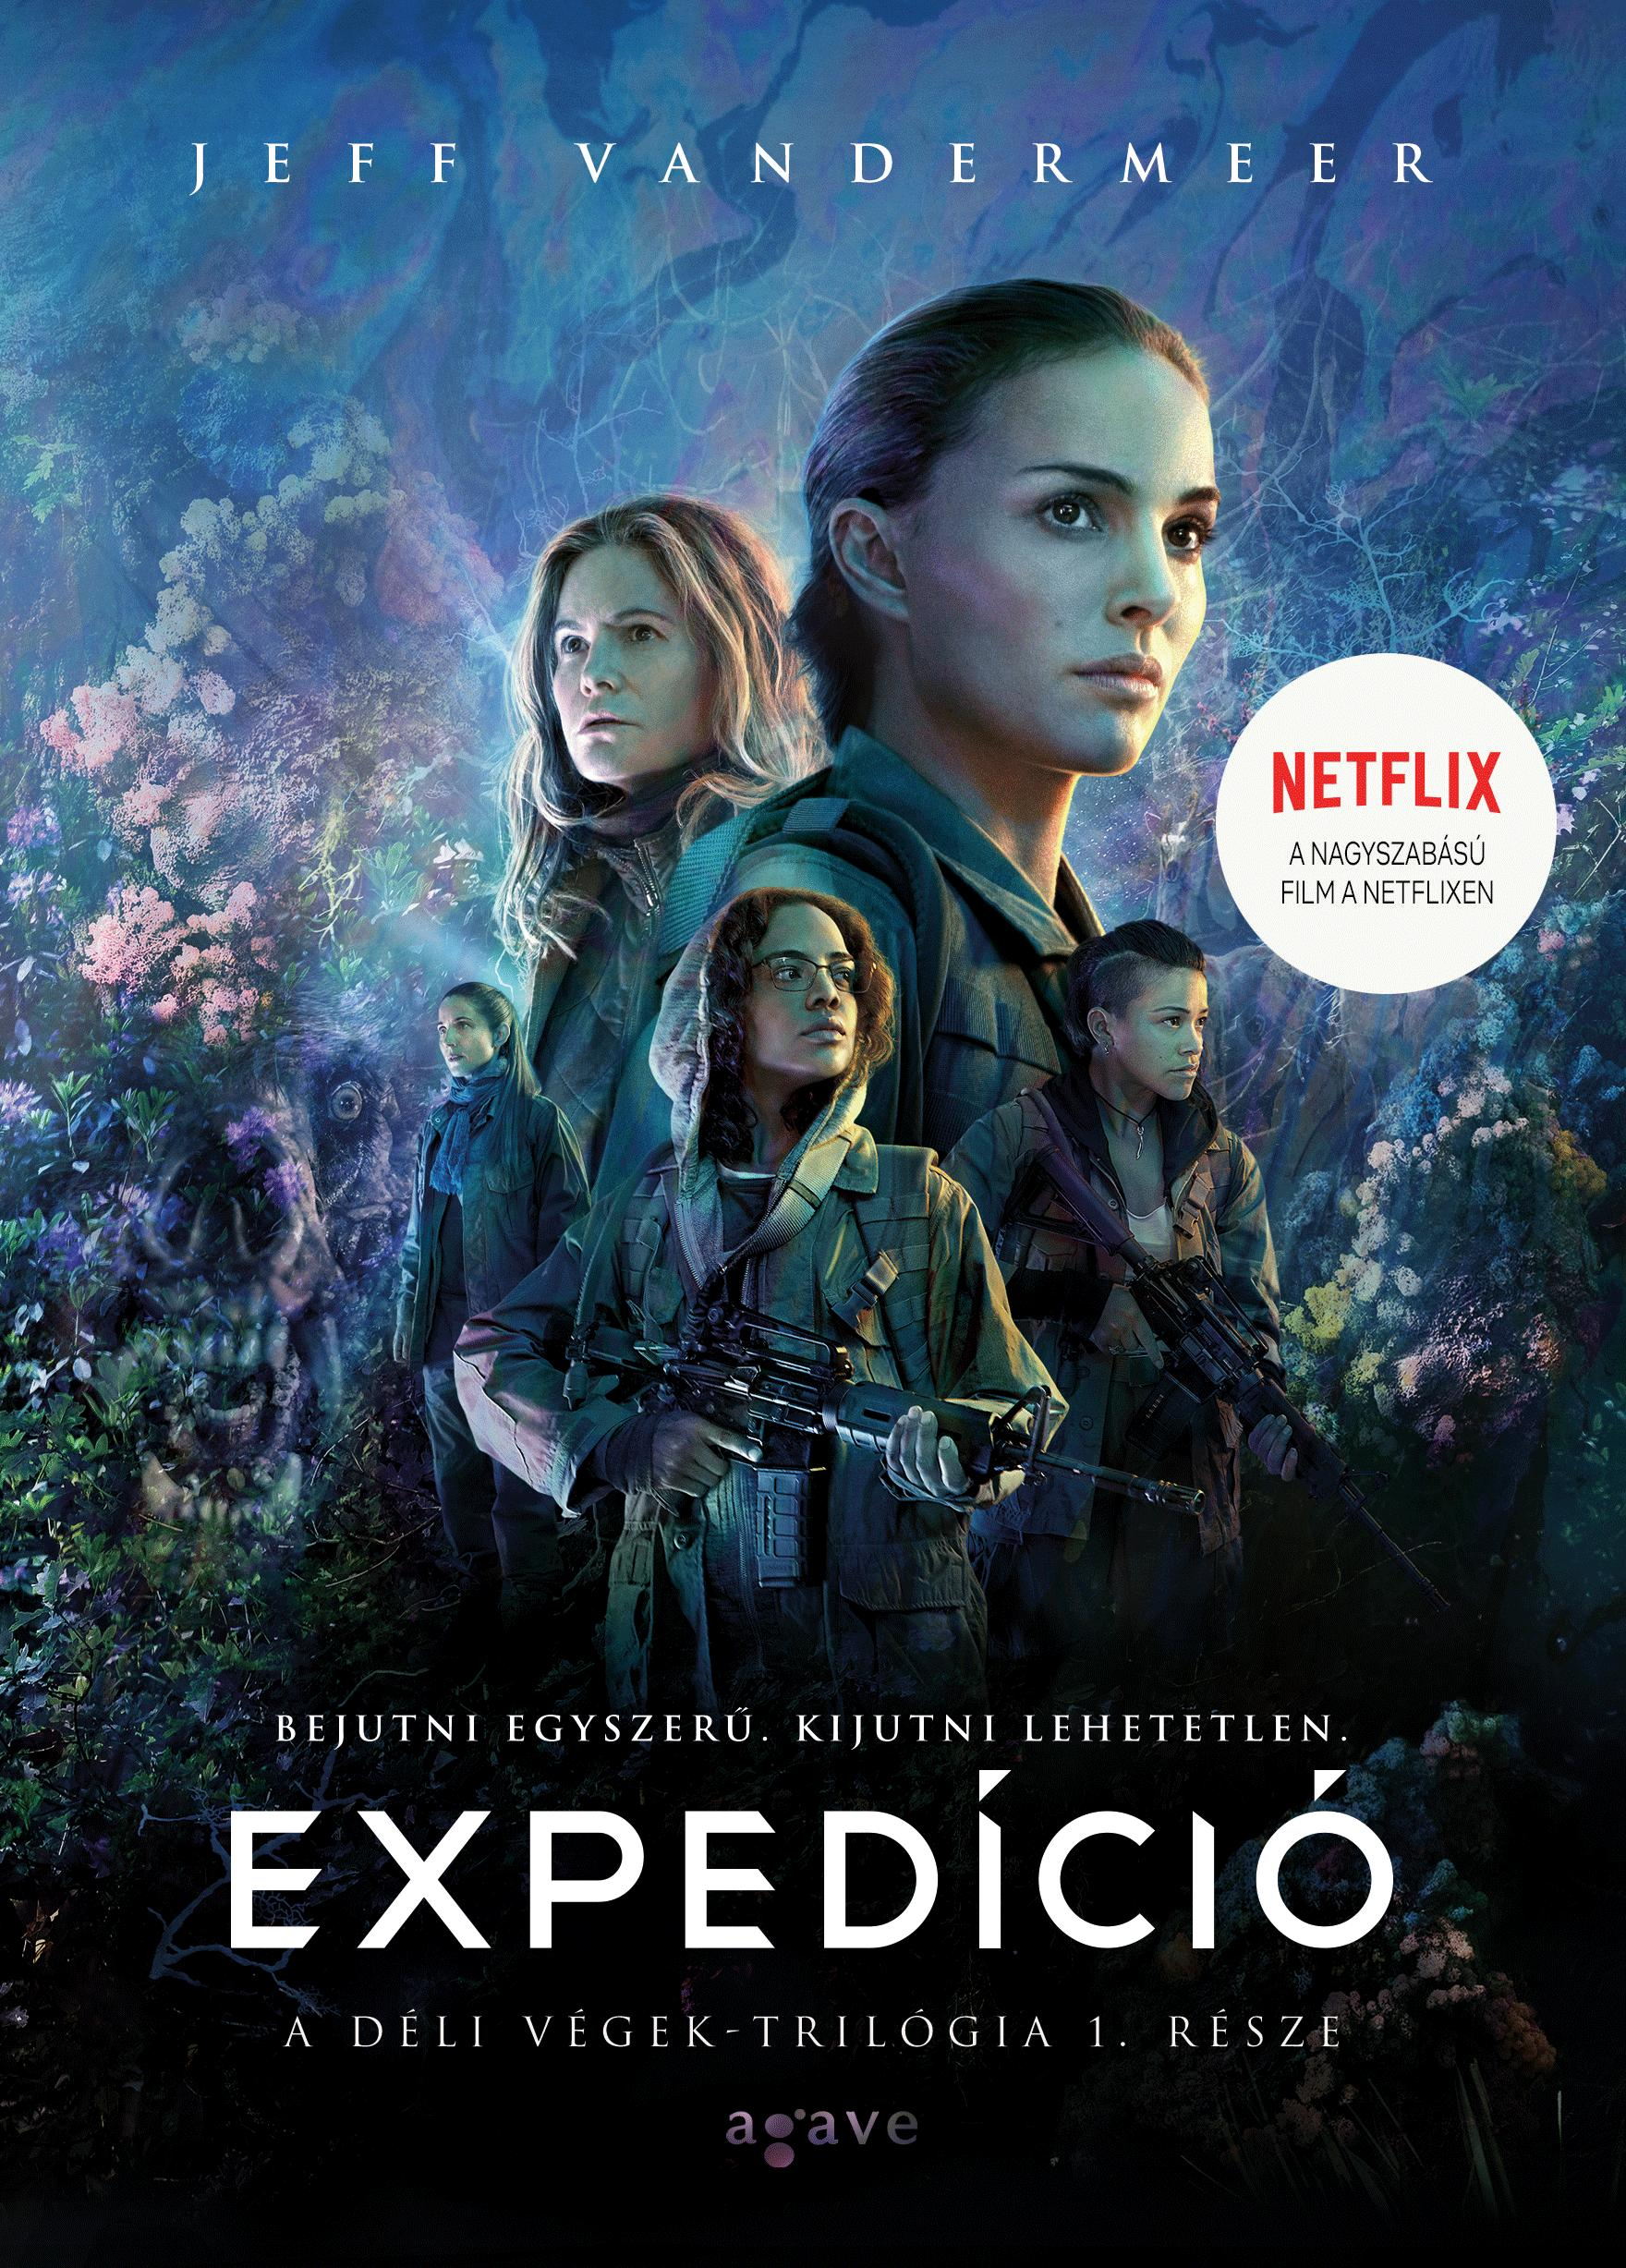 VANDERMEER, JEFF - EXPEDÍCIÓ - DÉLI VÉGEK-TRILÓGIA 1. (FILMES)